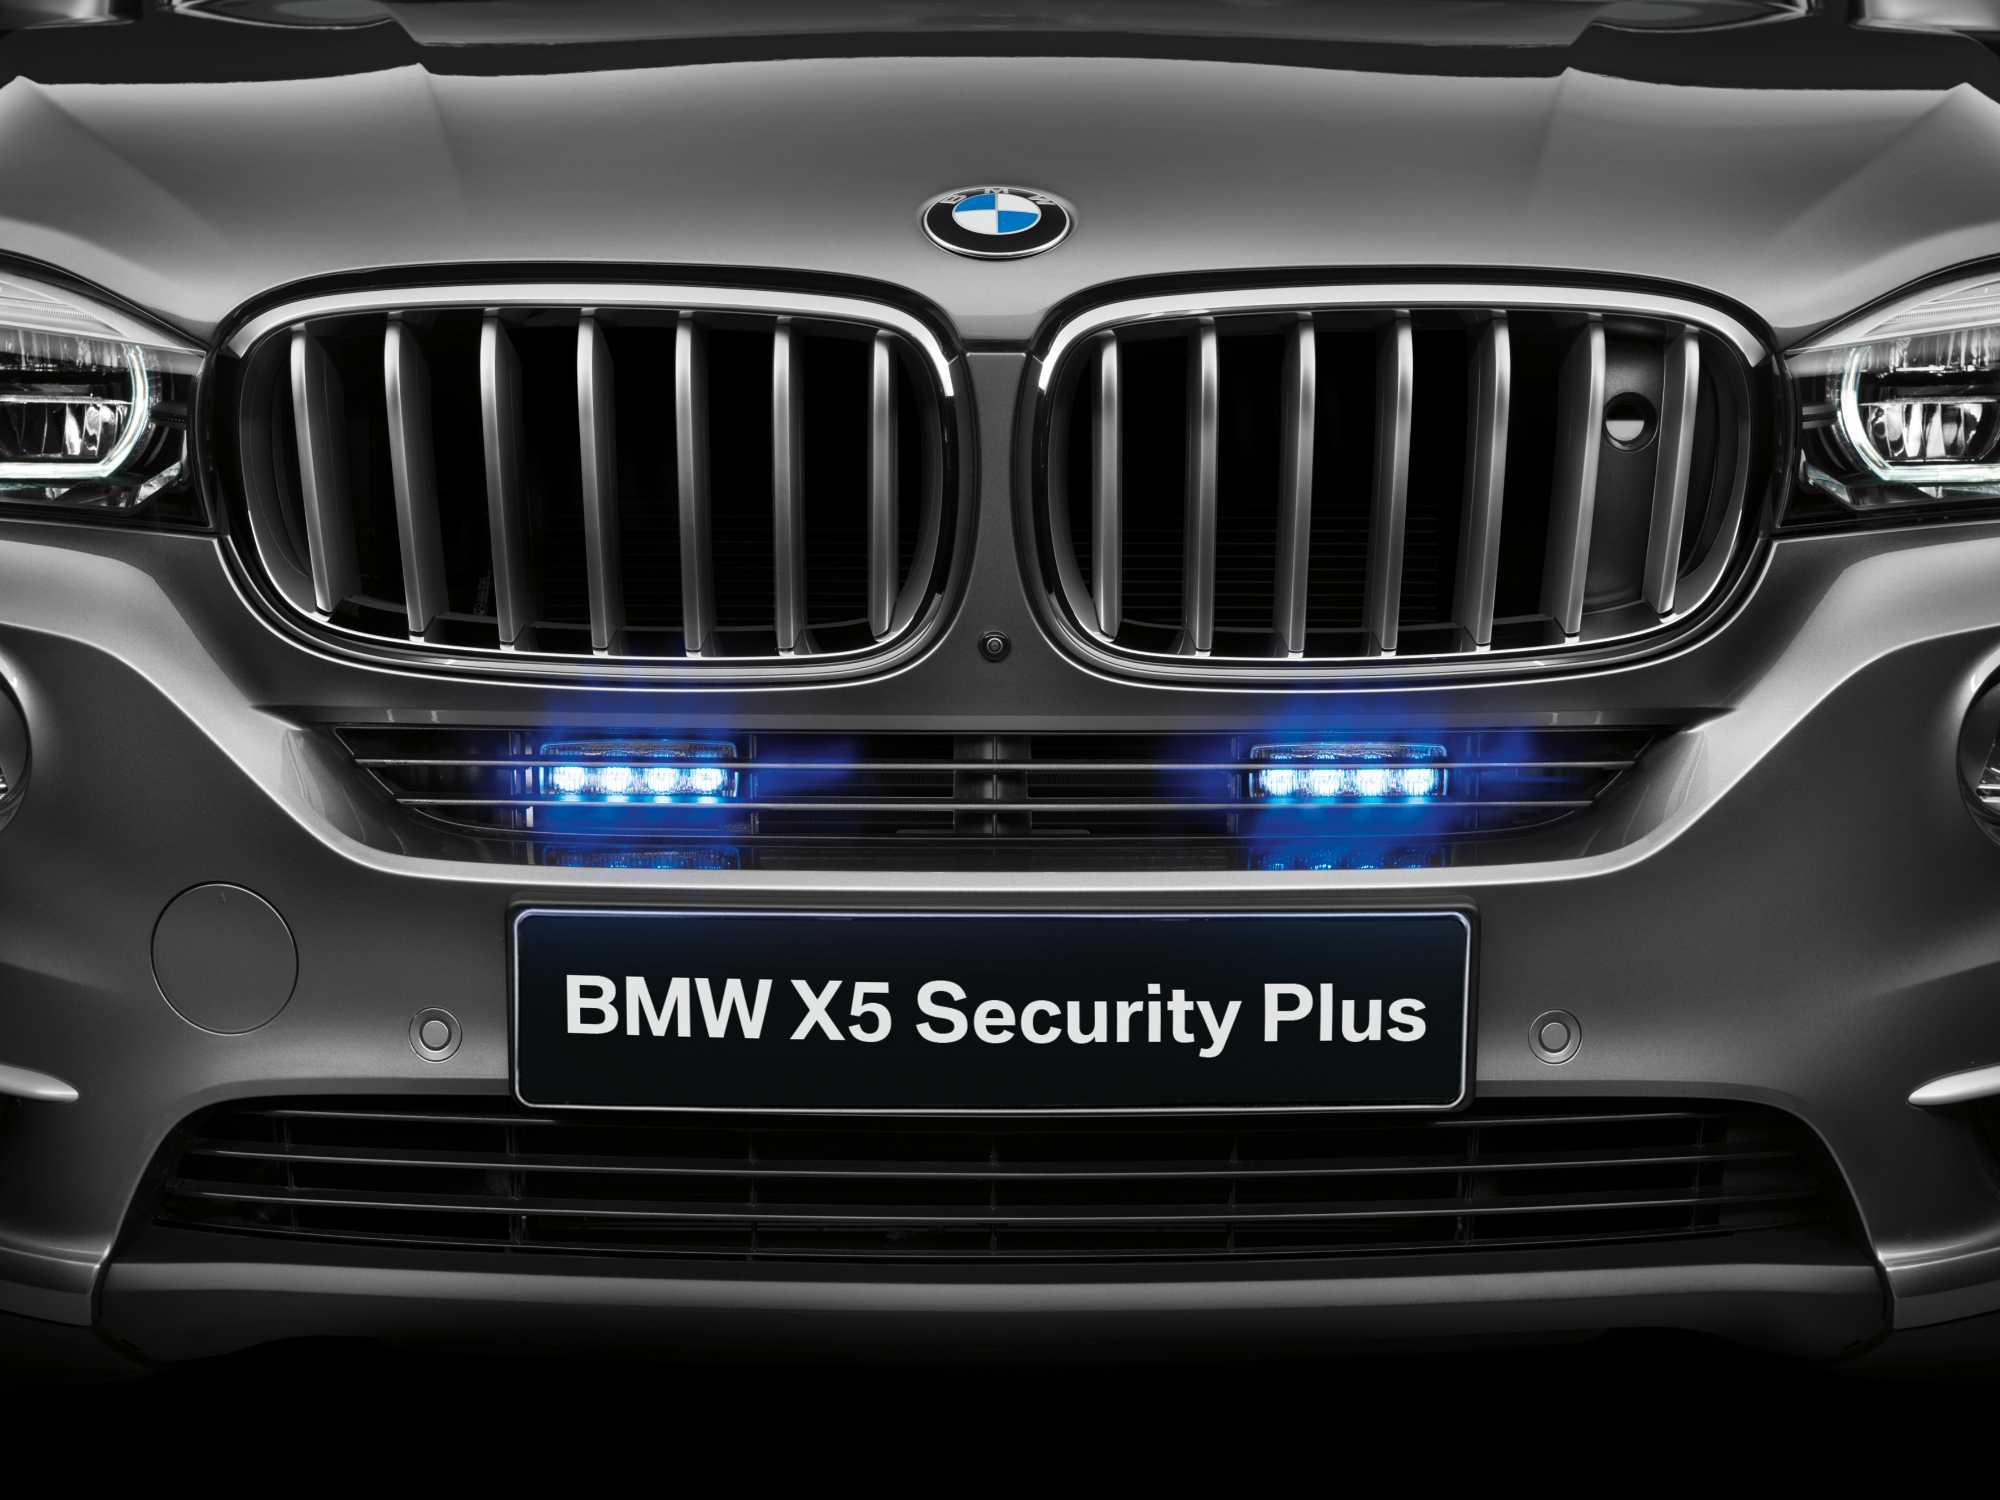 BMW X5 Security Plus LED flashing lights (07/2014)